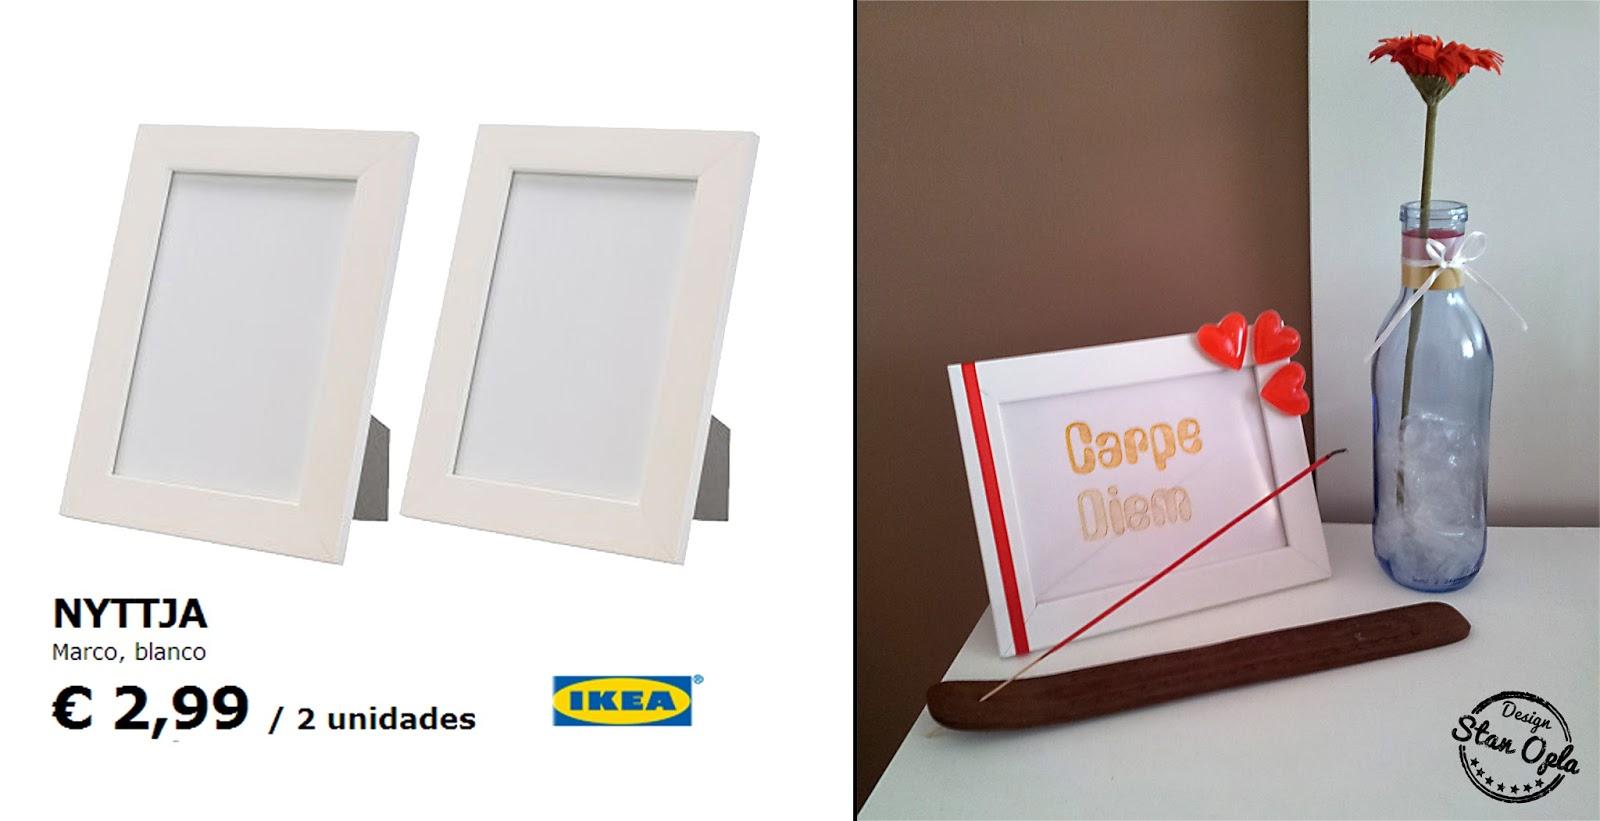 Stan Opla Designs: Customize frames / Personalizar marcos